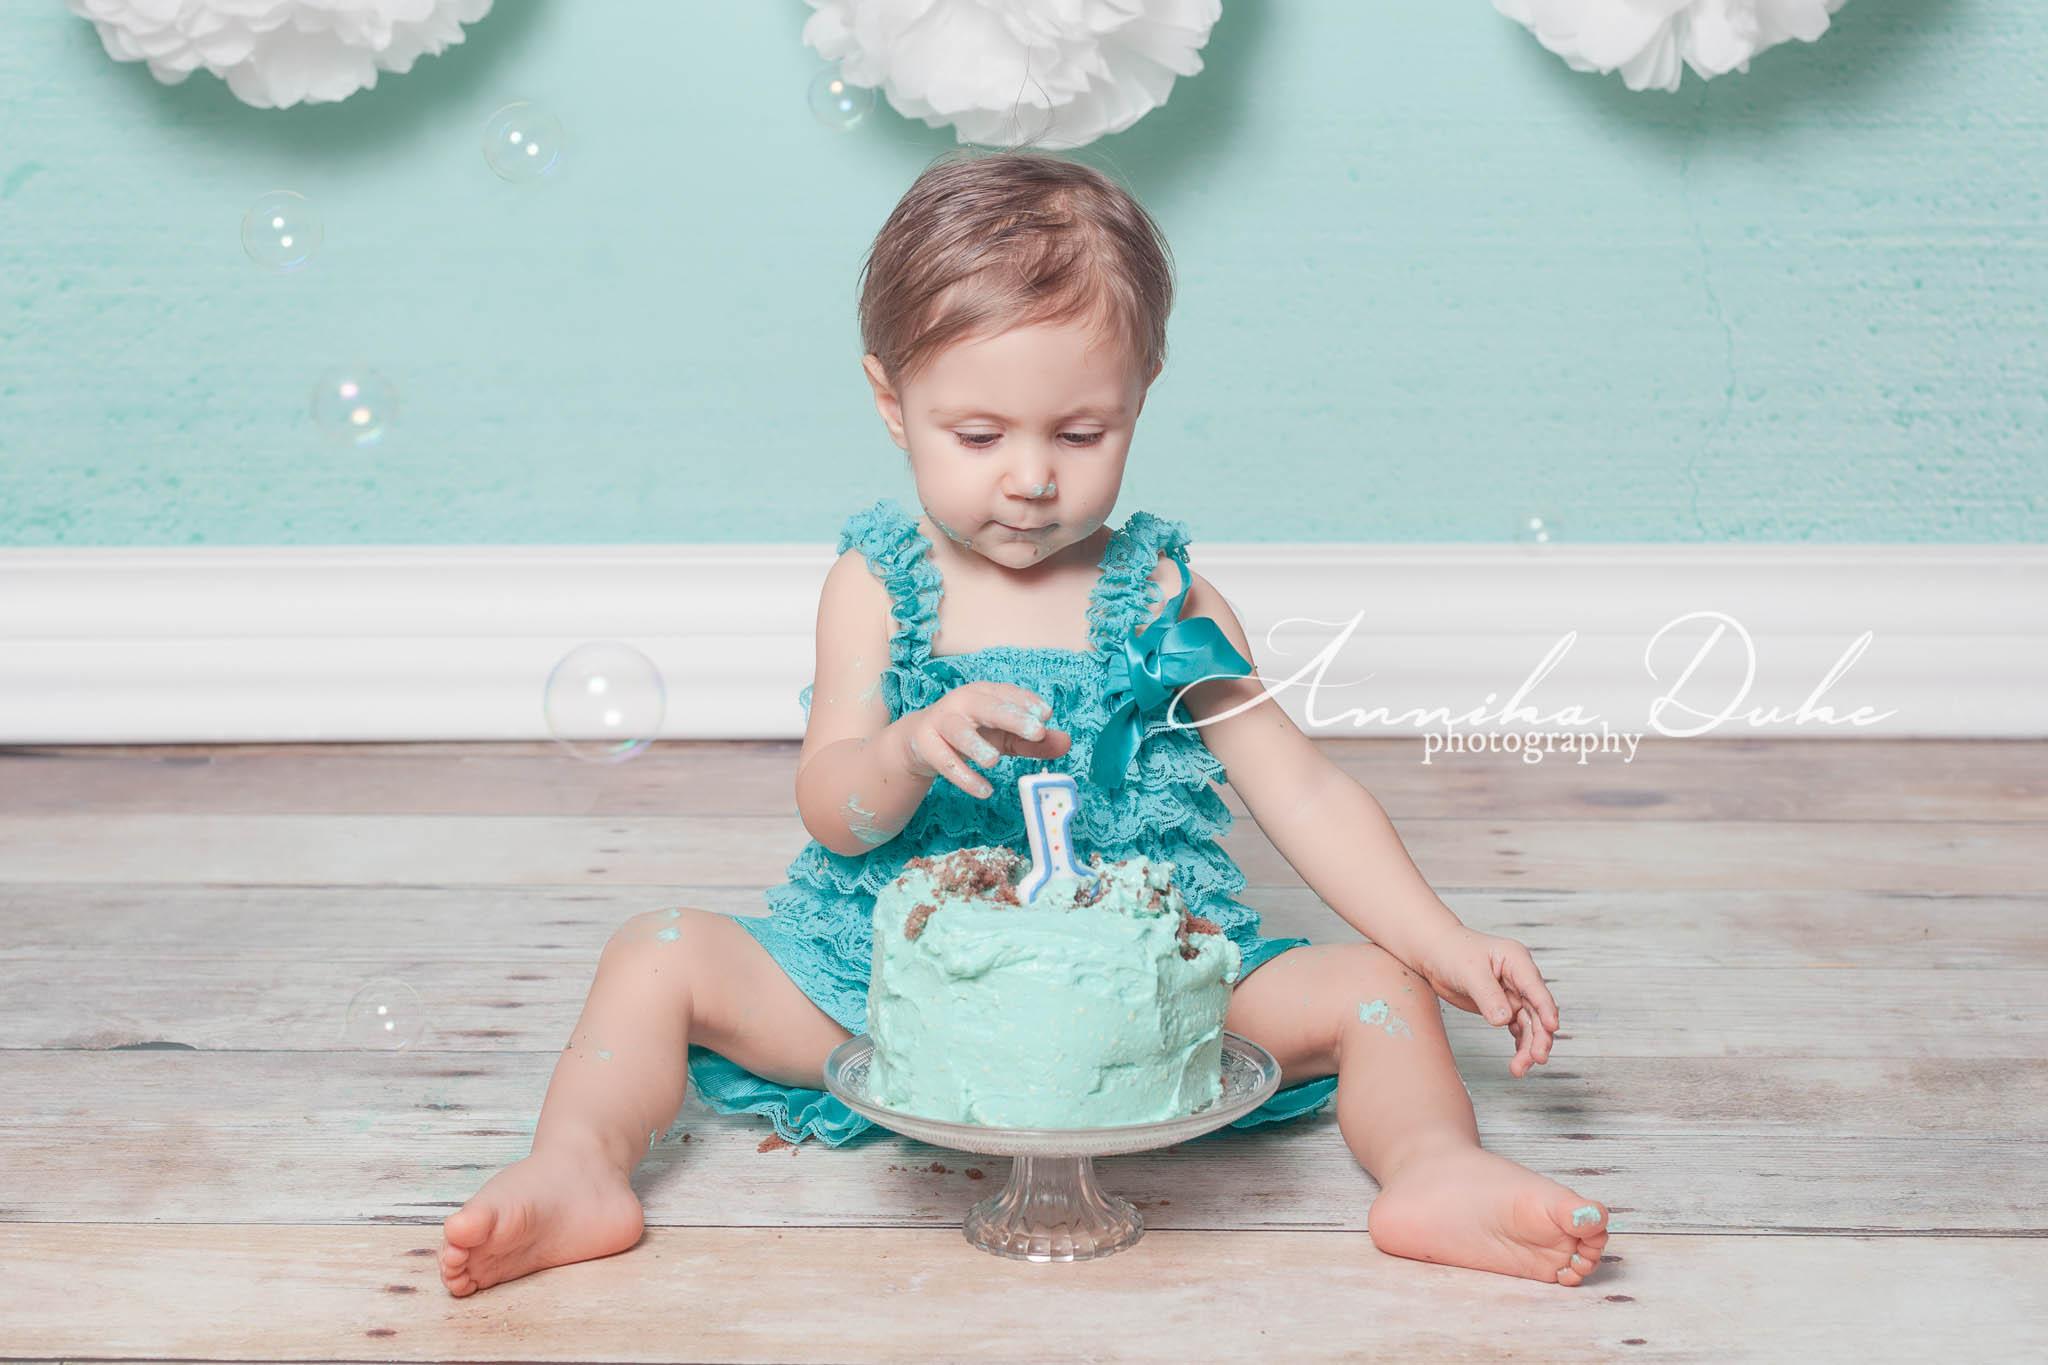 Emma_cake_smash-128-Edit_AD_klein